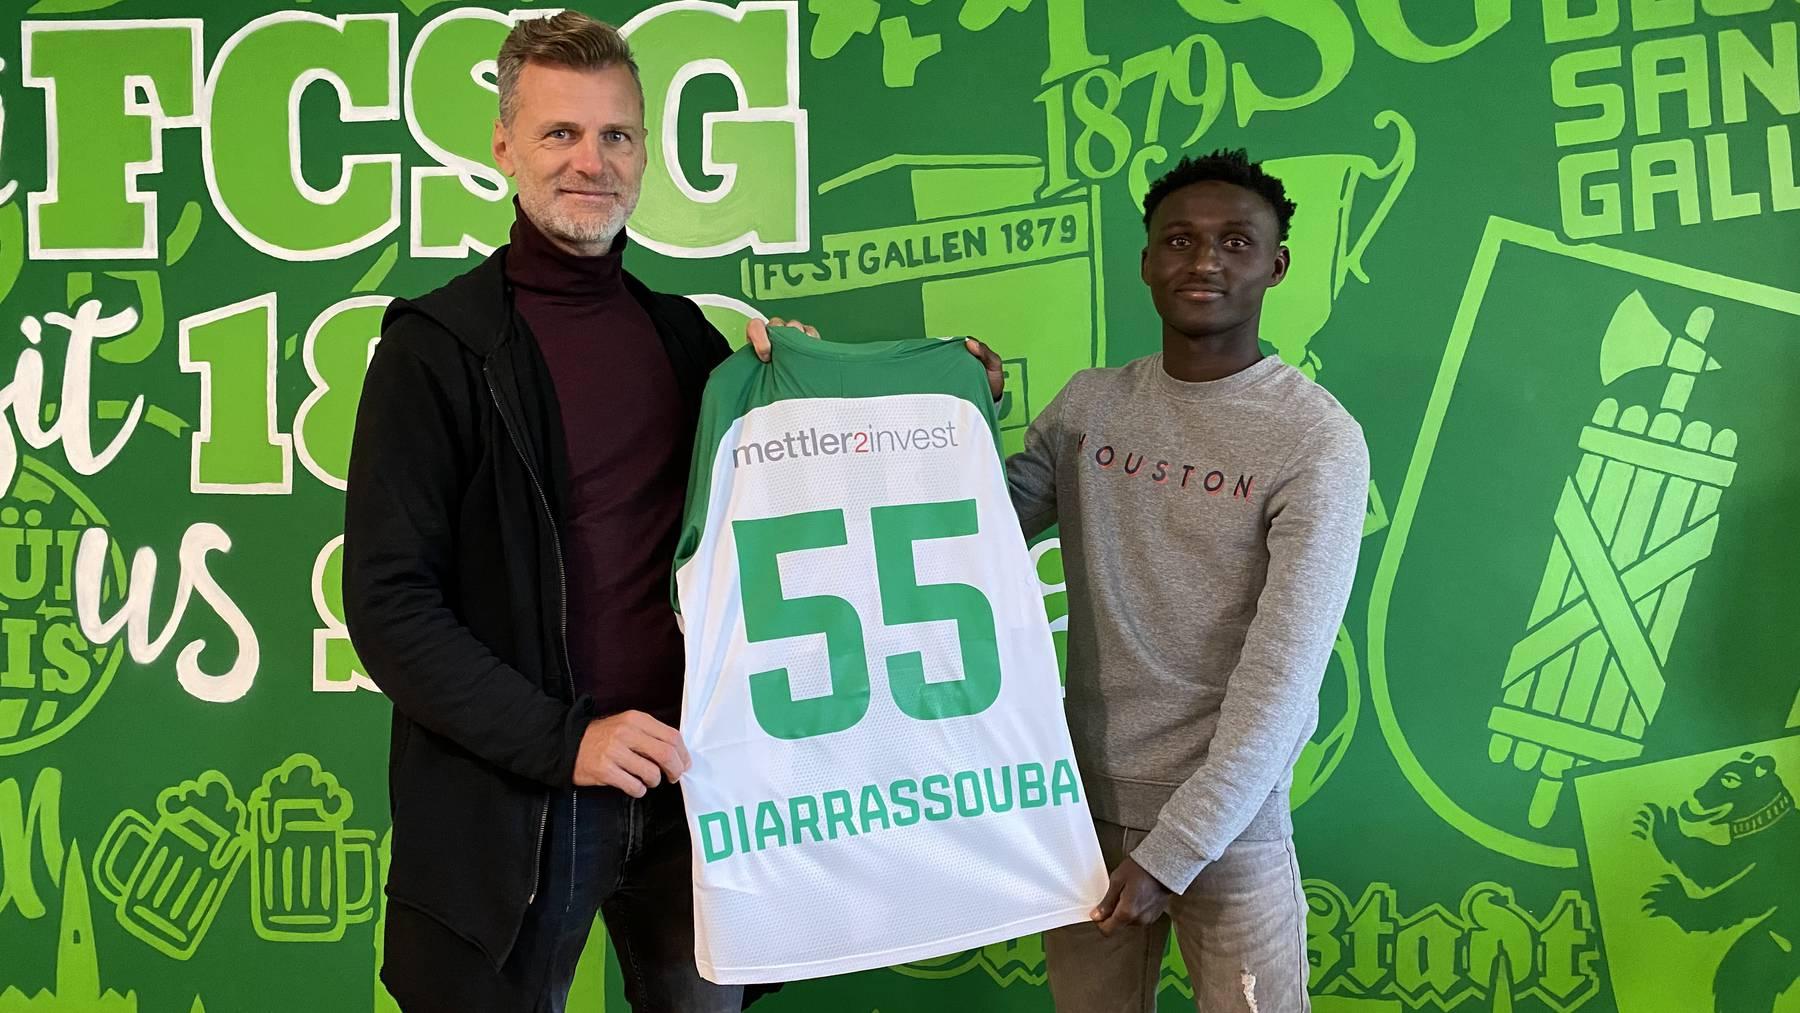 FCSG-Sportchef Alain Sutter mit Salifou Diarrassouba